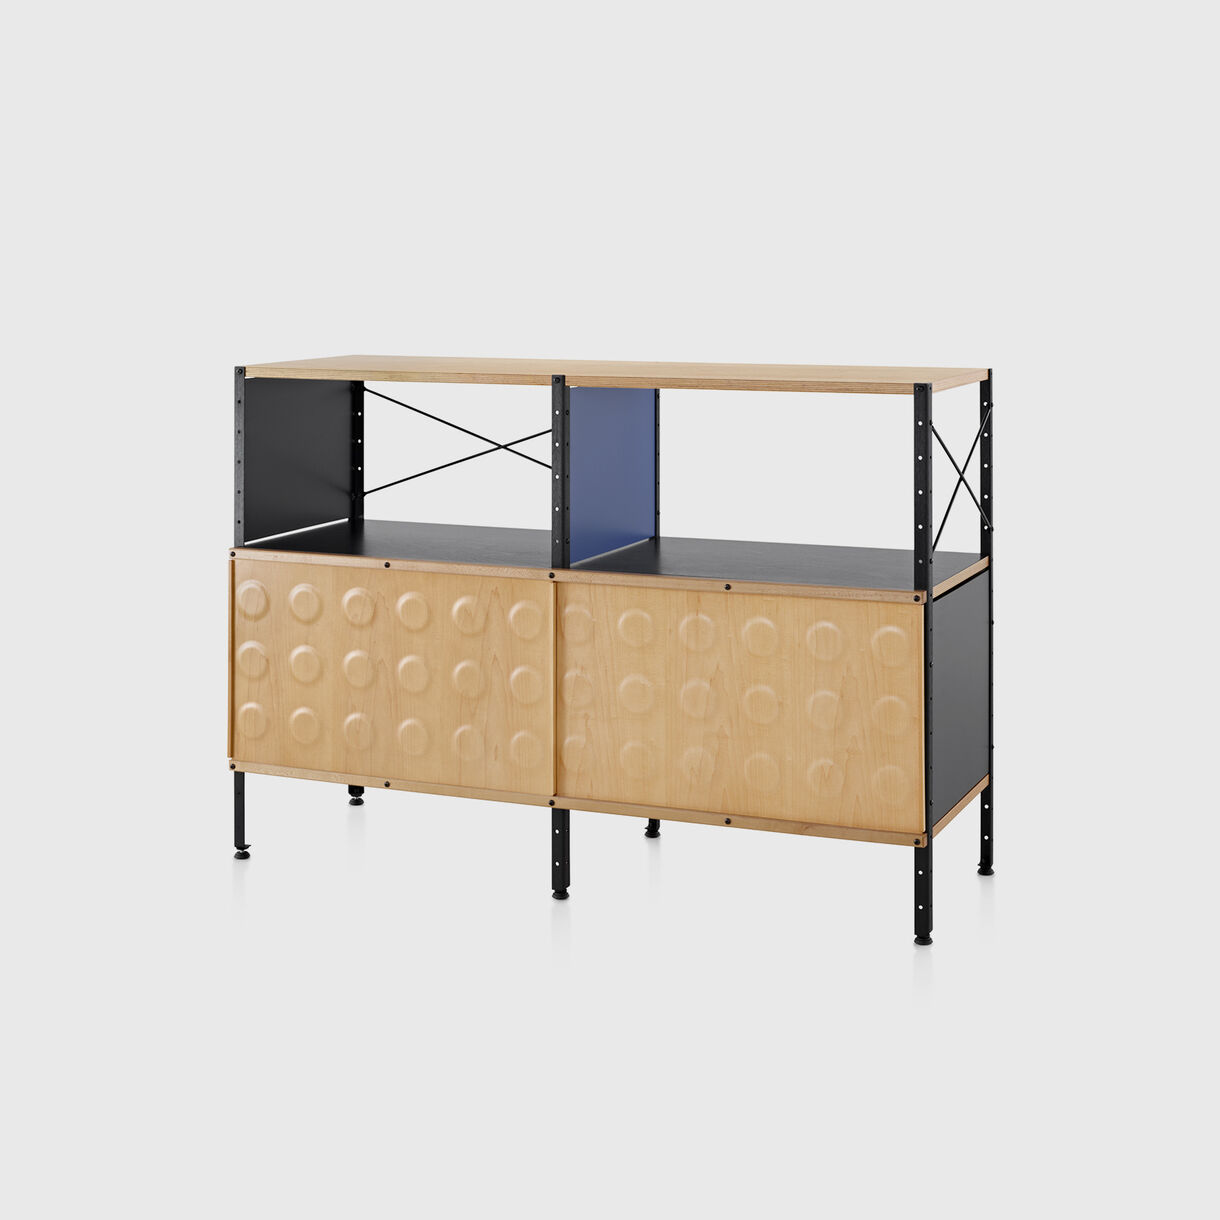 Eames Storage Unit, 2x2 with Doors